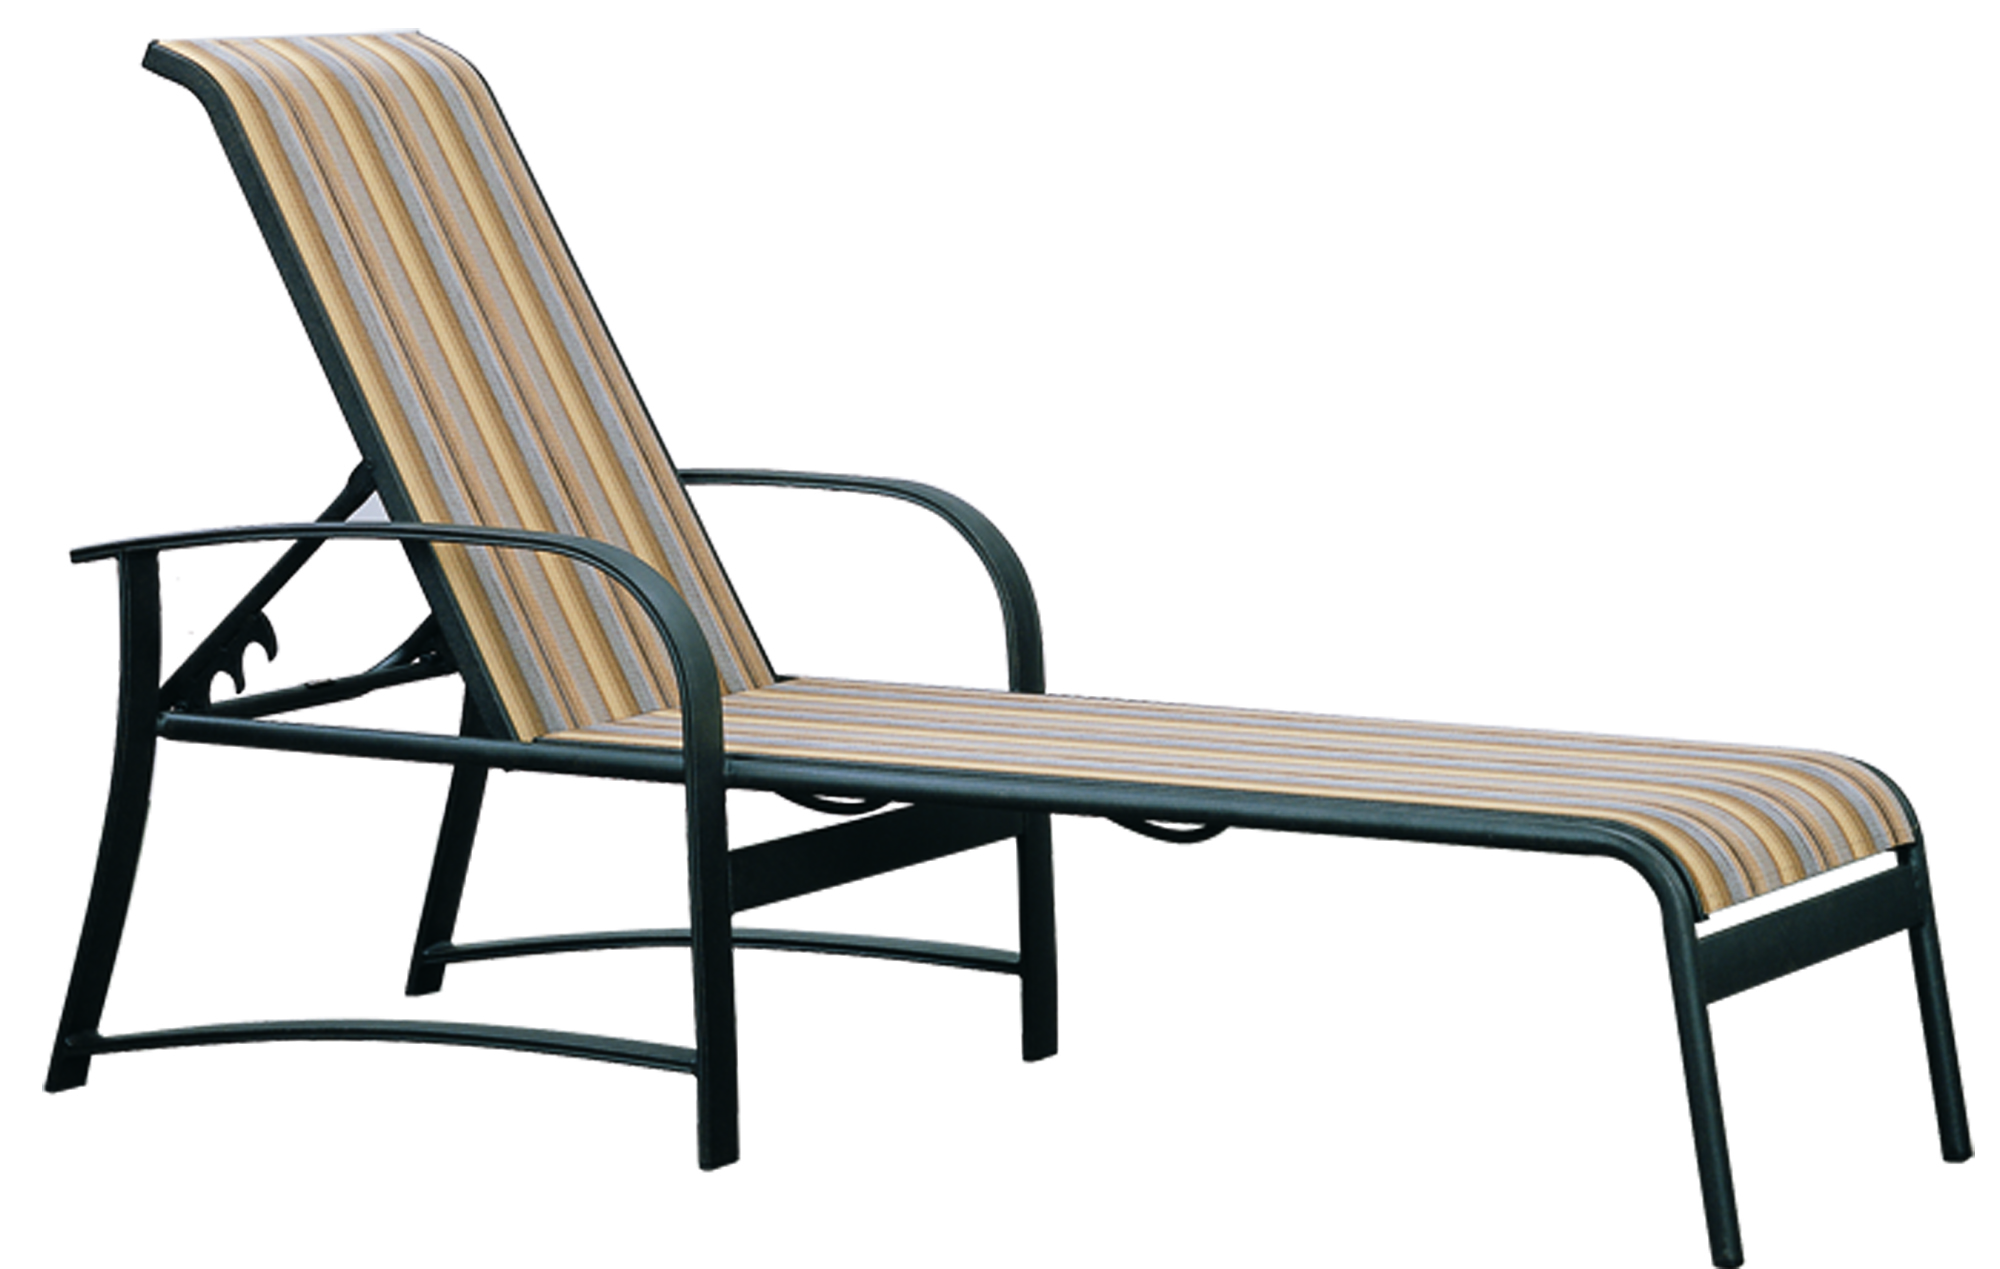 971051 Hermosa Adjustable Chaise   28.4 x 82.9 x 23.5